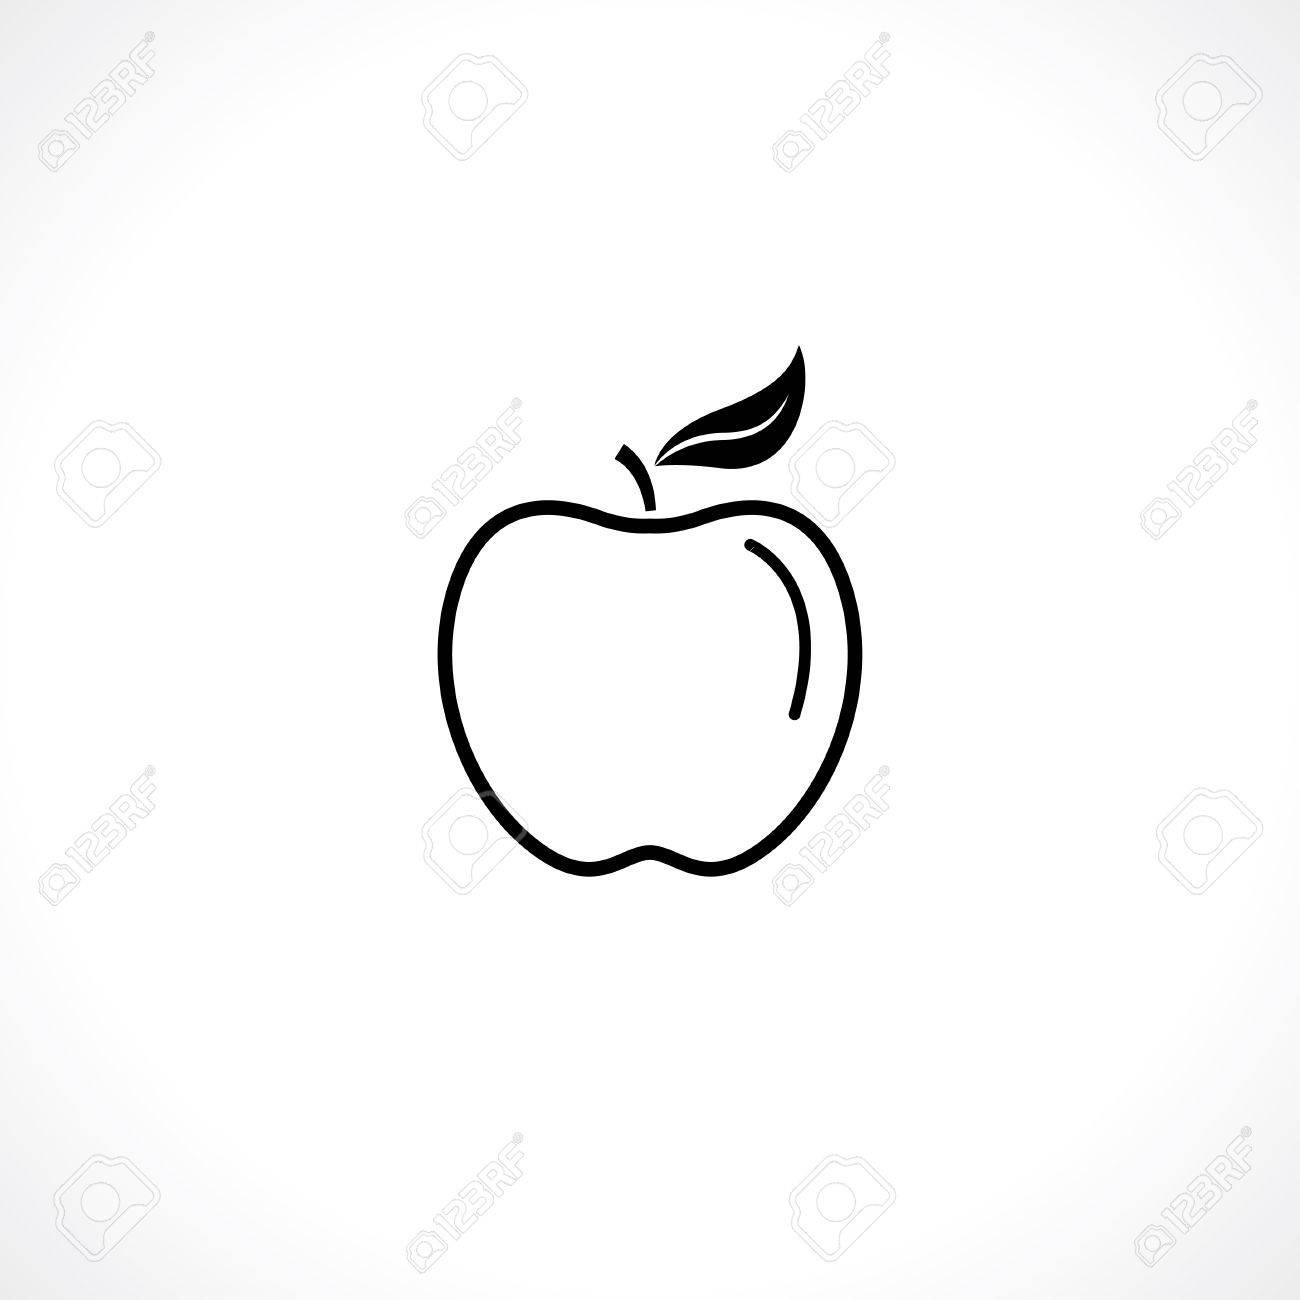 Apple Symbol Black Outline Icon Isolated On White